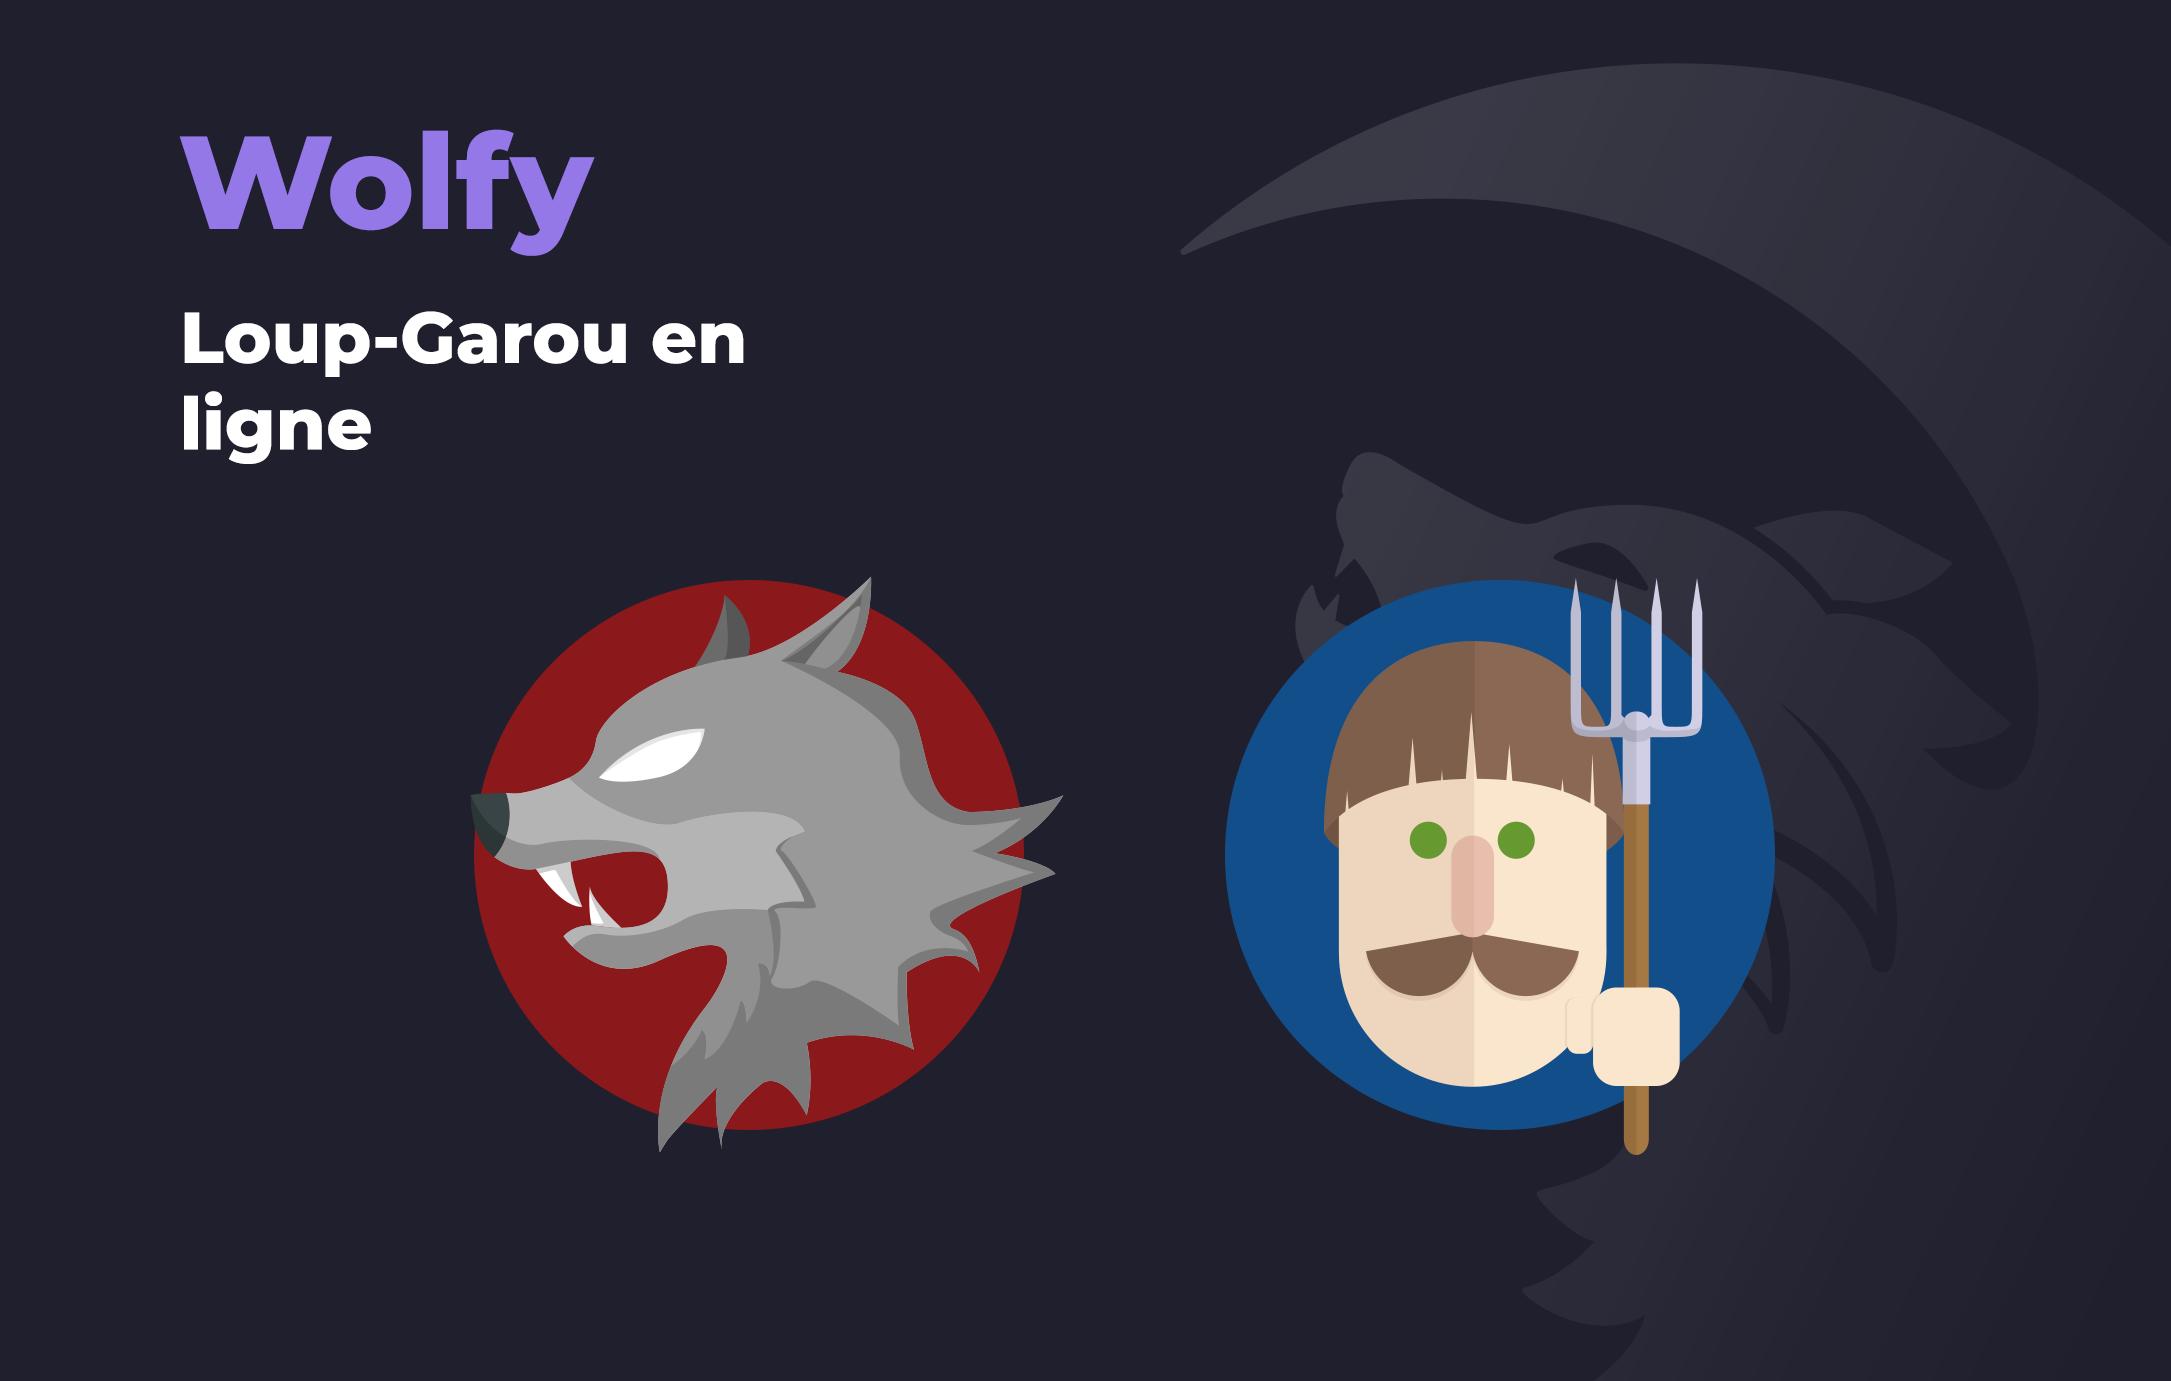 Wolfy, loup-garou en ligne